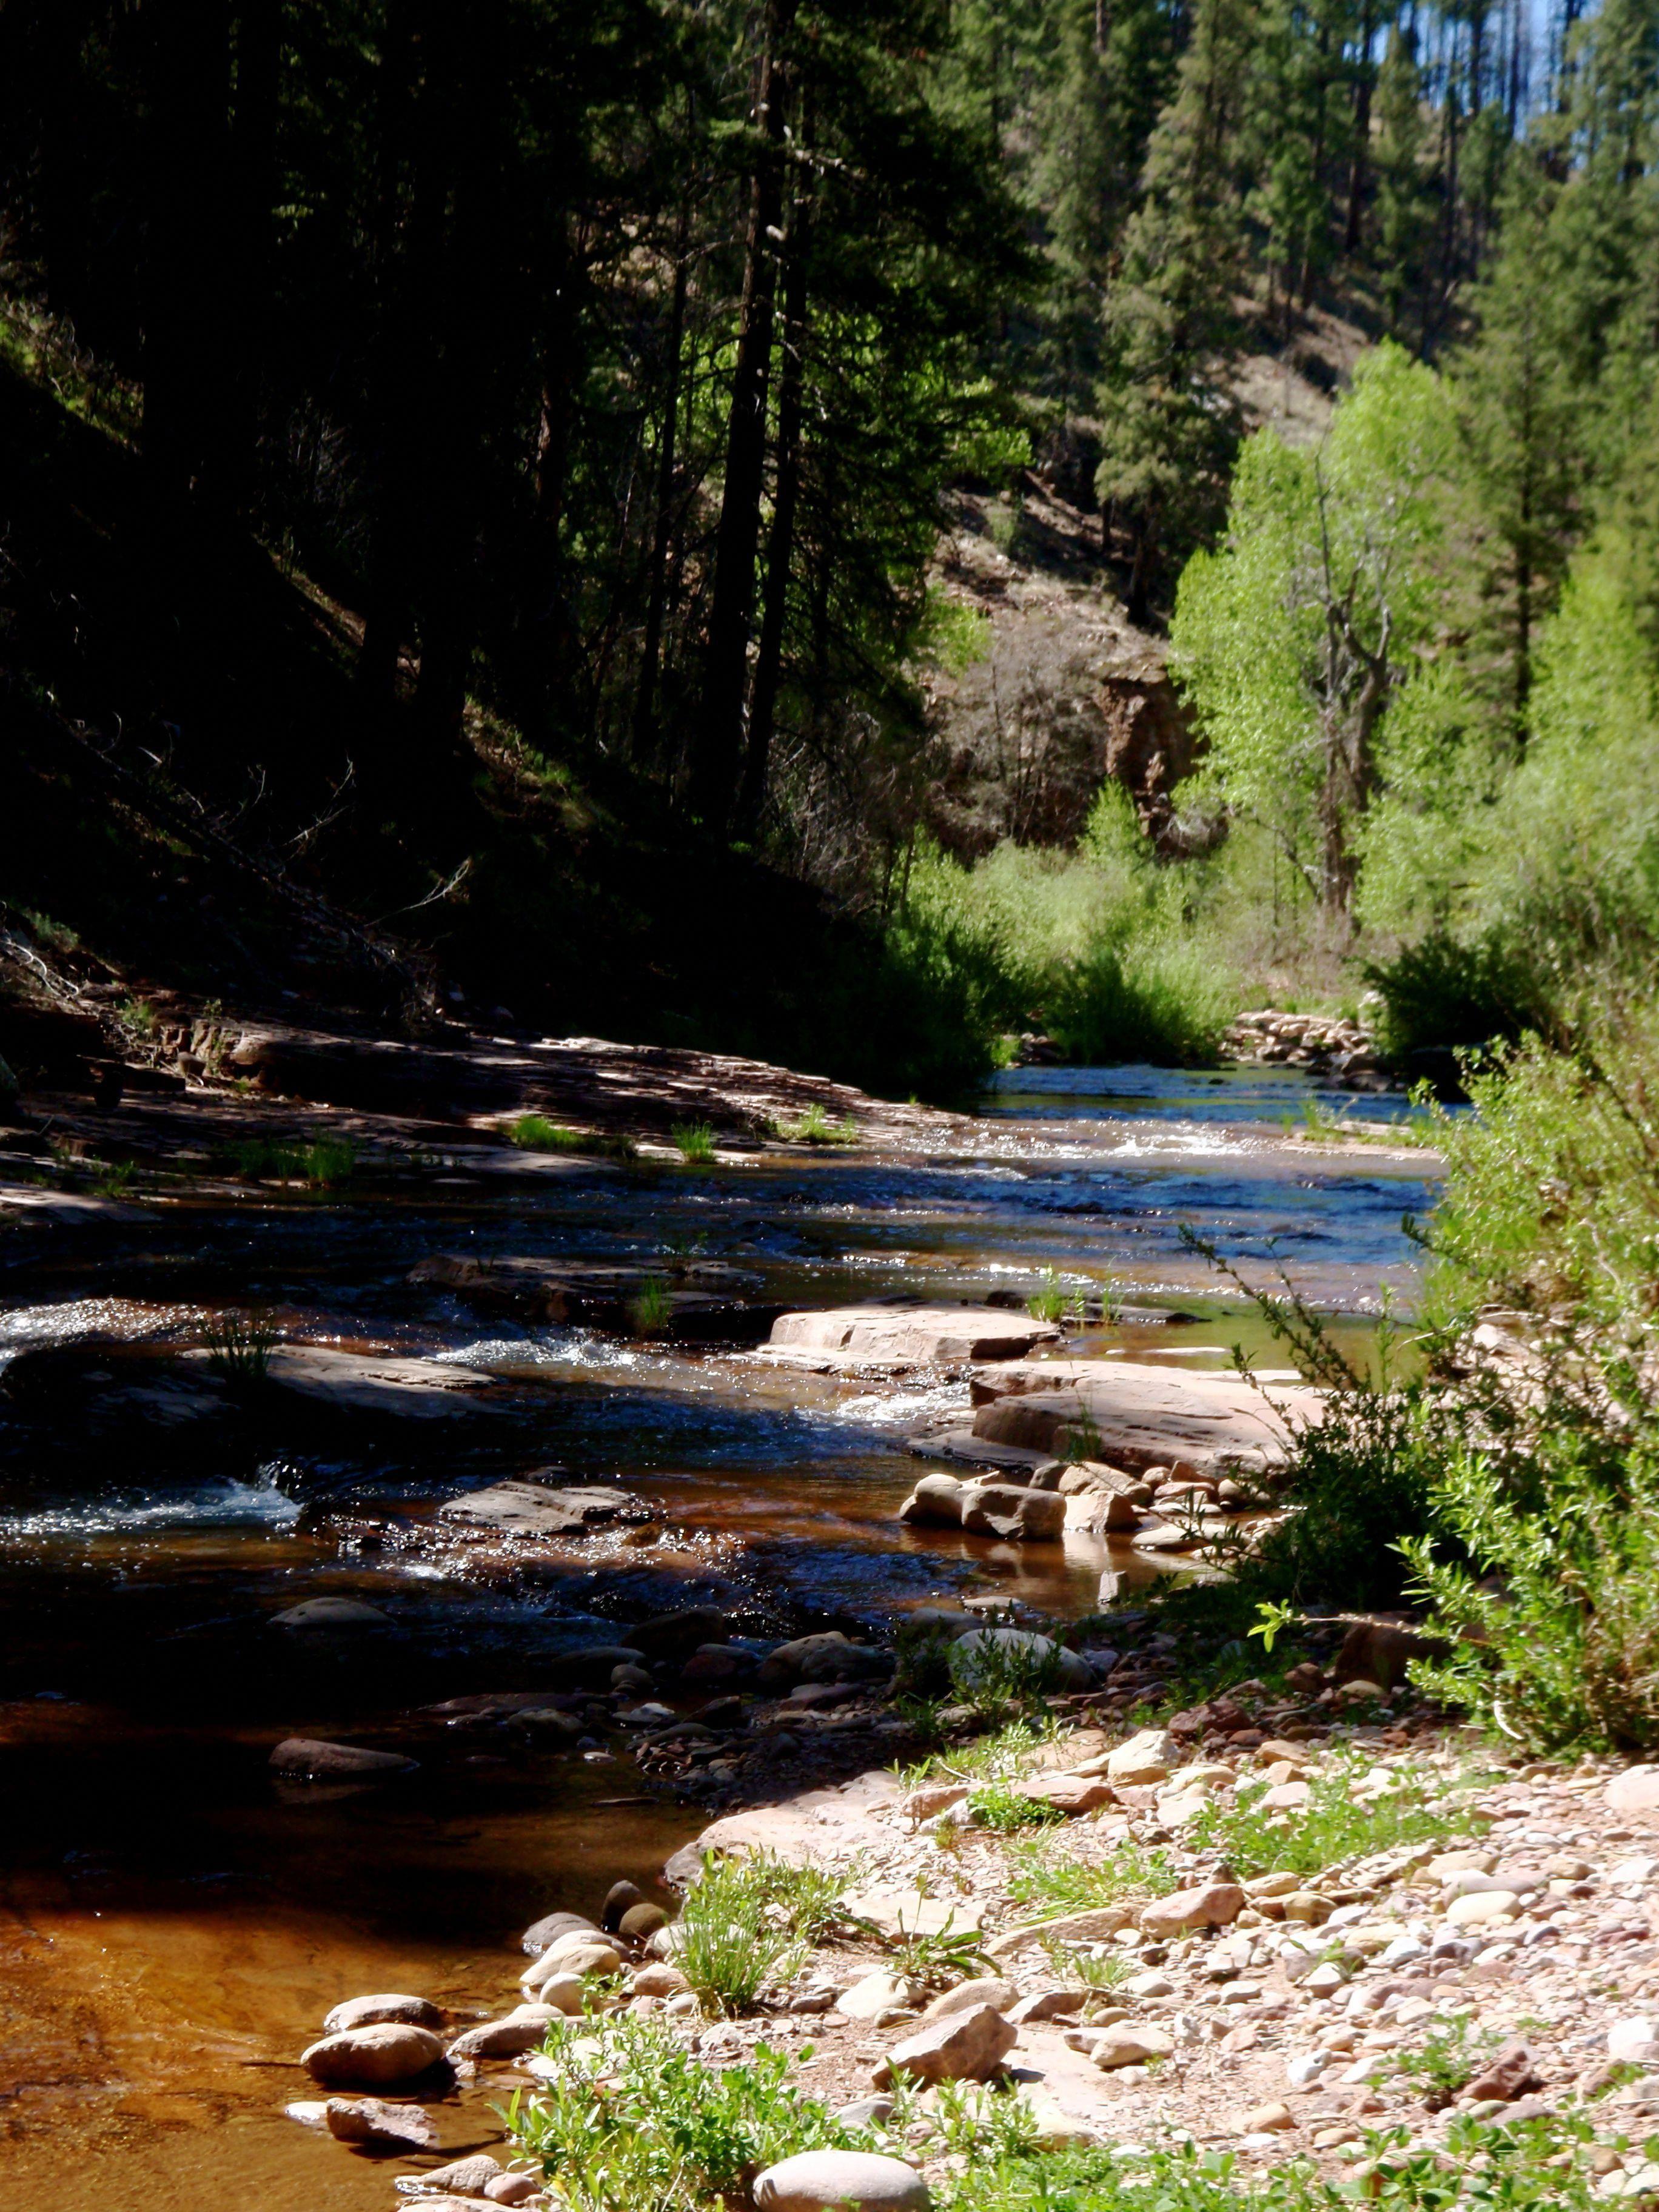 Fly Fishing Arizona's creeks | Fly fishing, Fishing places ...